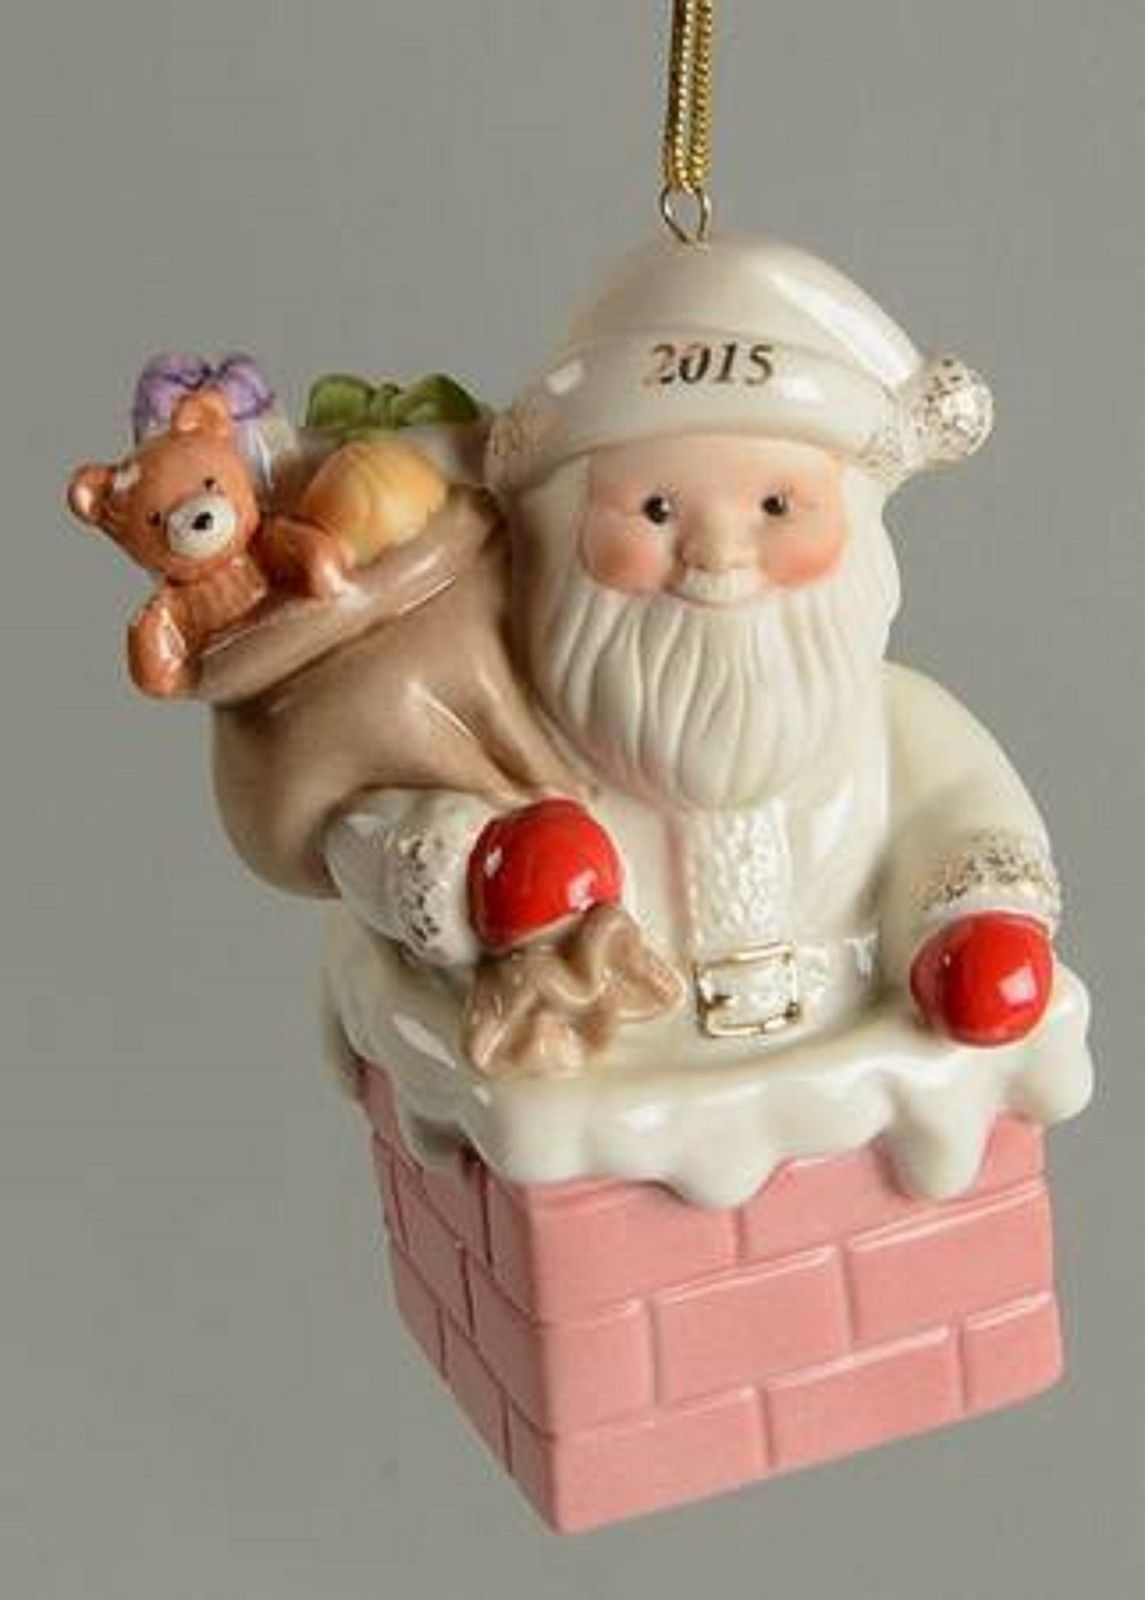 Lenox 2015 Santa Figurine Ornament Annual Santa's Gift Express Christmas NEW